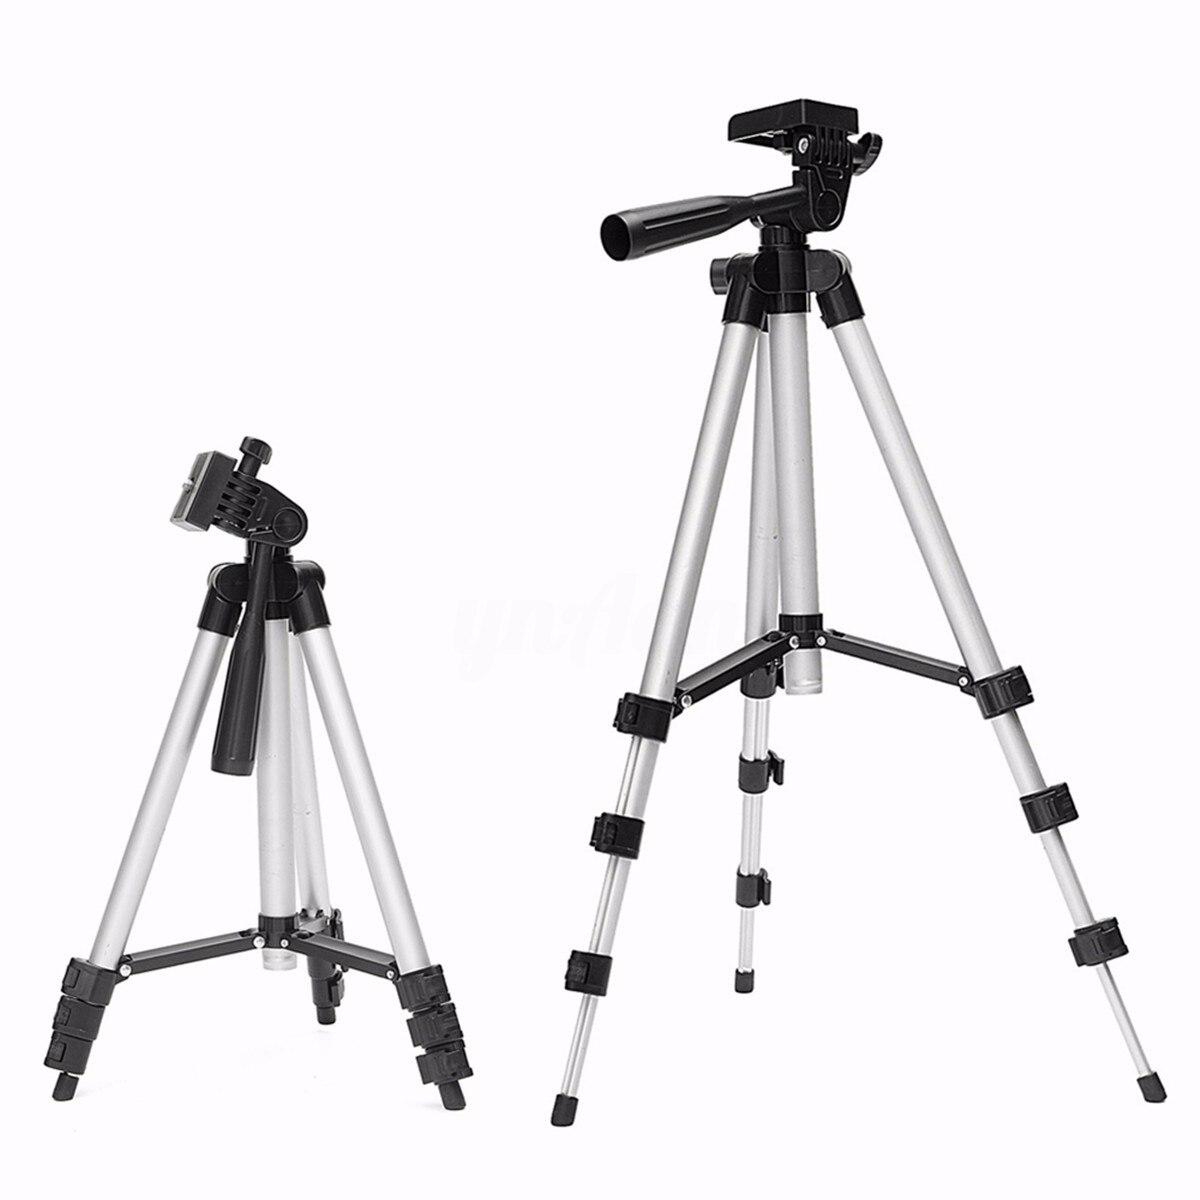 29-65cm Lightweight Aluminum Mini Tripod 4 Sections Universal Camera Tripod Camera Stand Photo Tripod Gorillapod Tripe